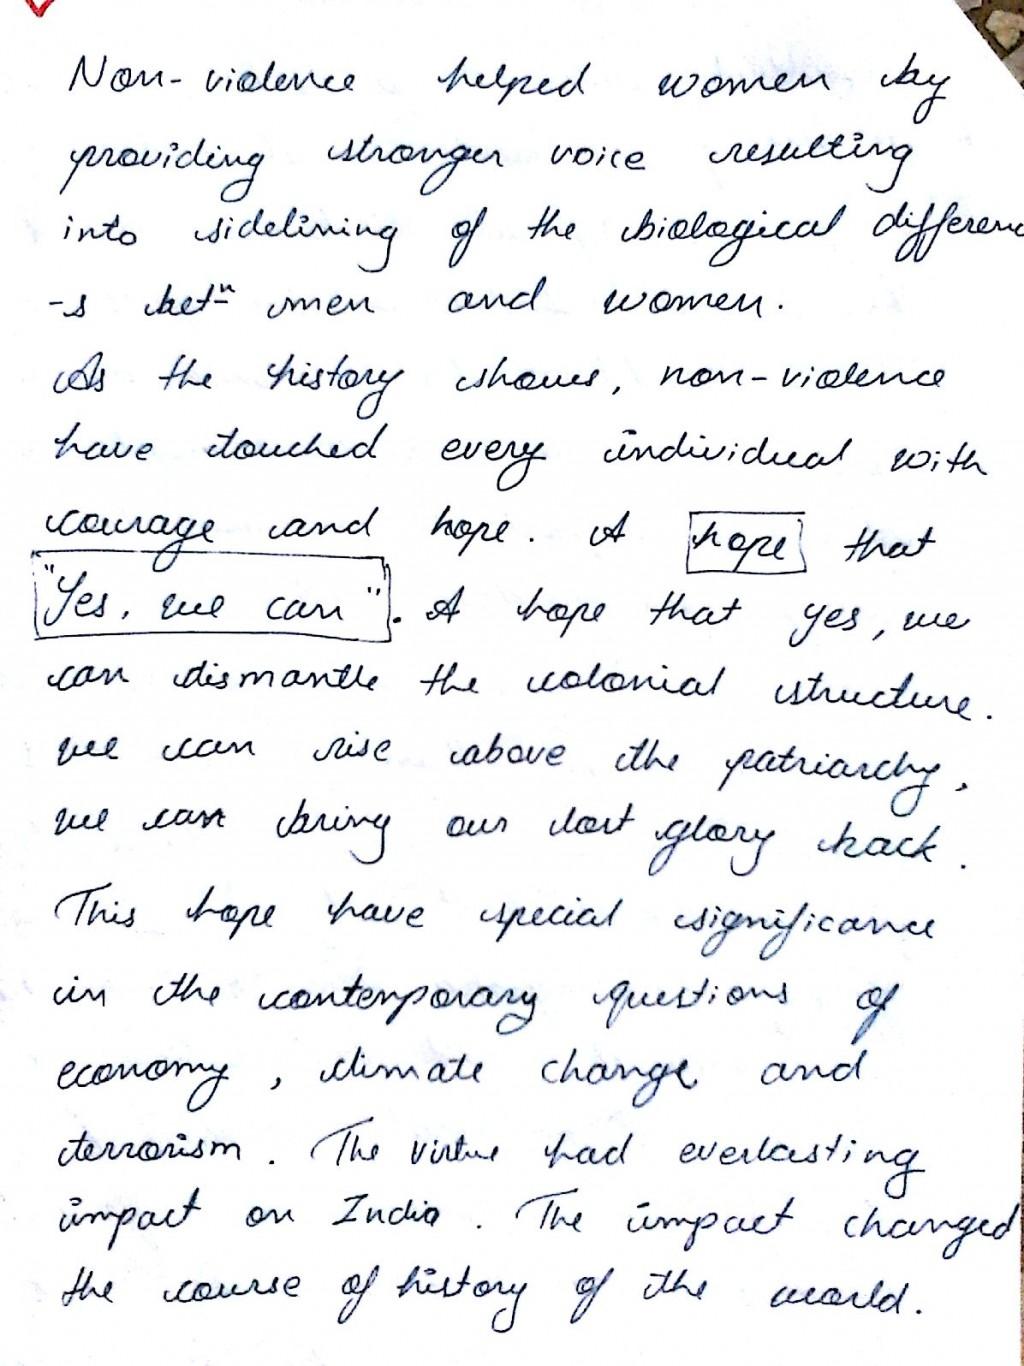 003 Terrorism Essay Example New Doc 20 8 Wonderful Topics In English War On Large